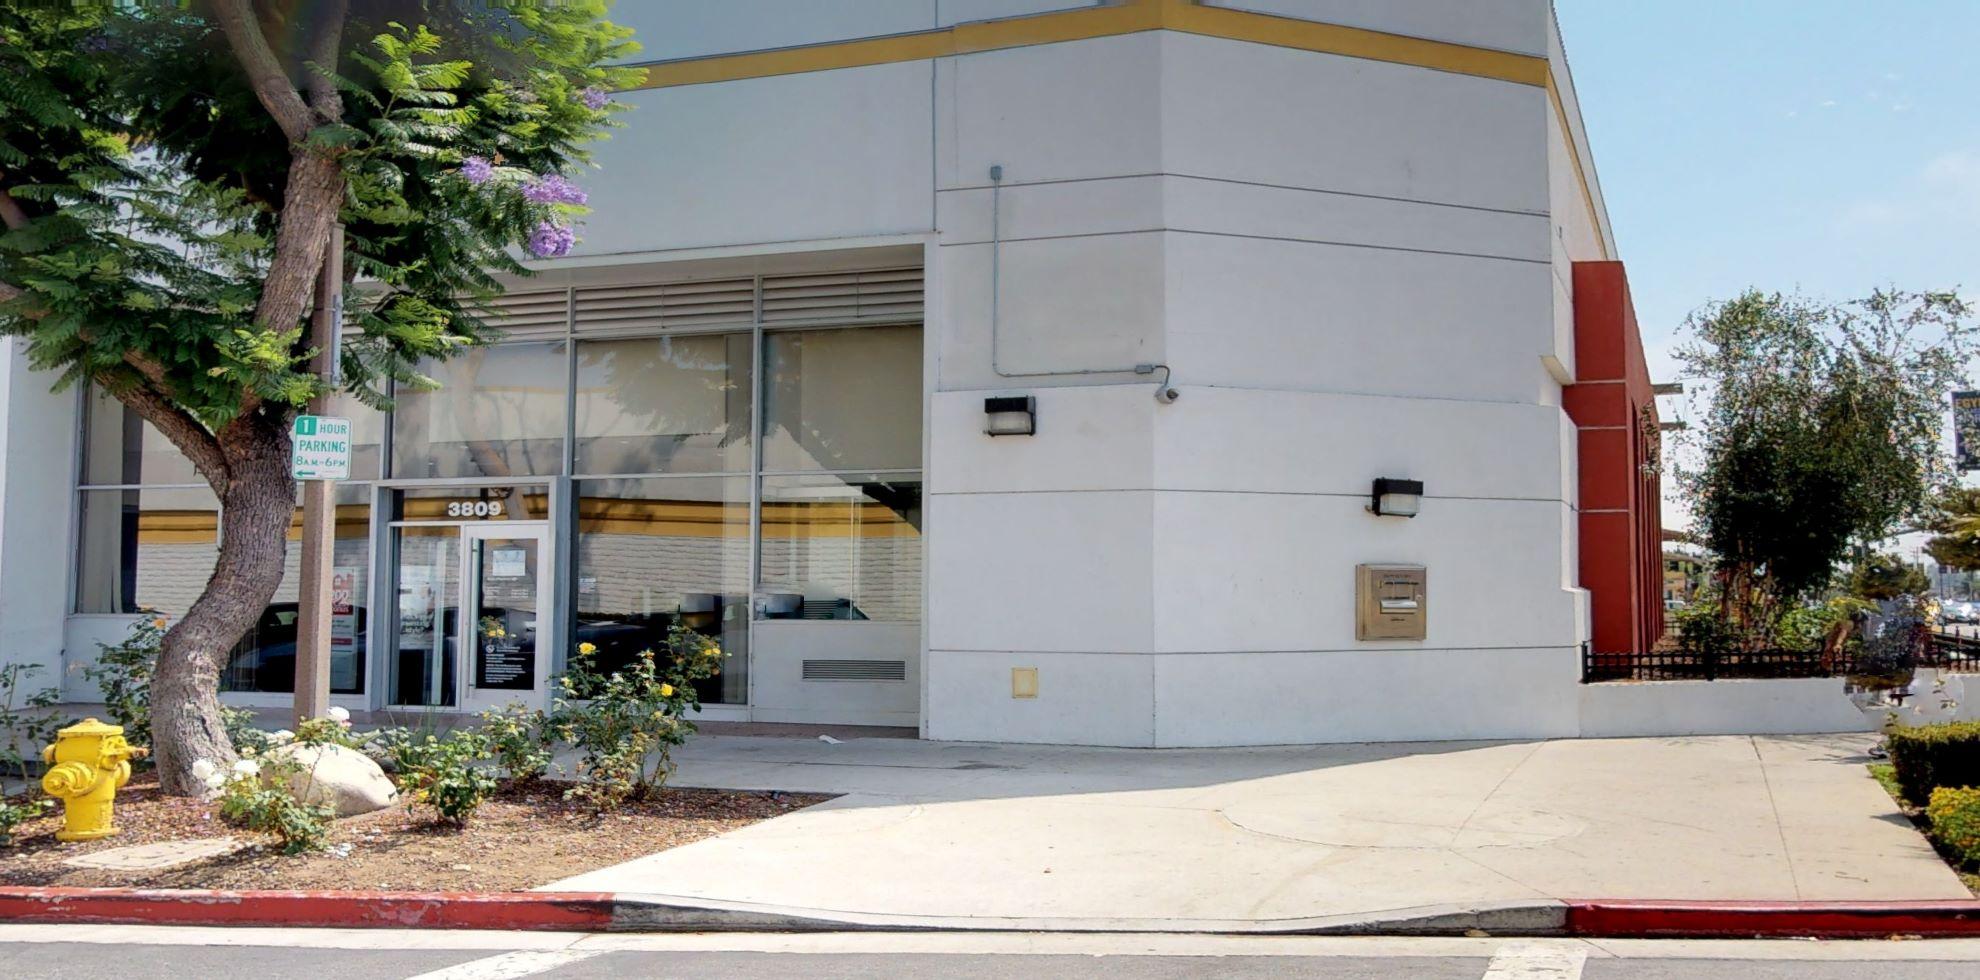 Bank of America financial center with walk-up ATM   3809 Culver Ctr, Culver City, CA 90232